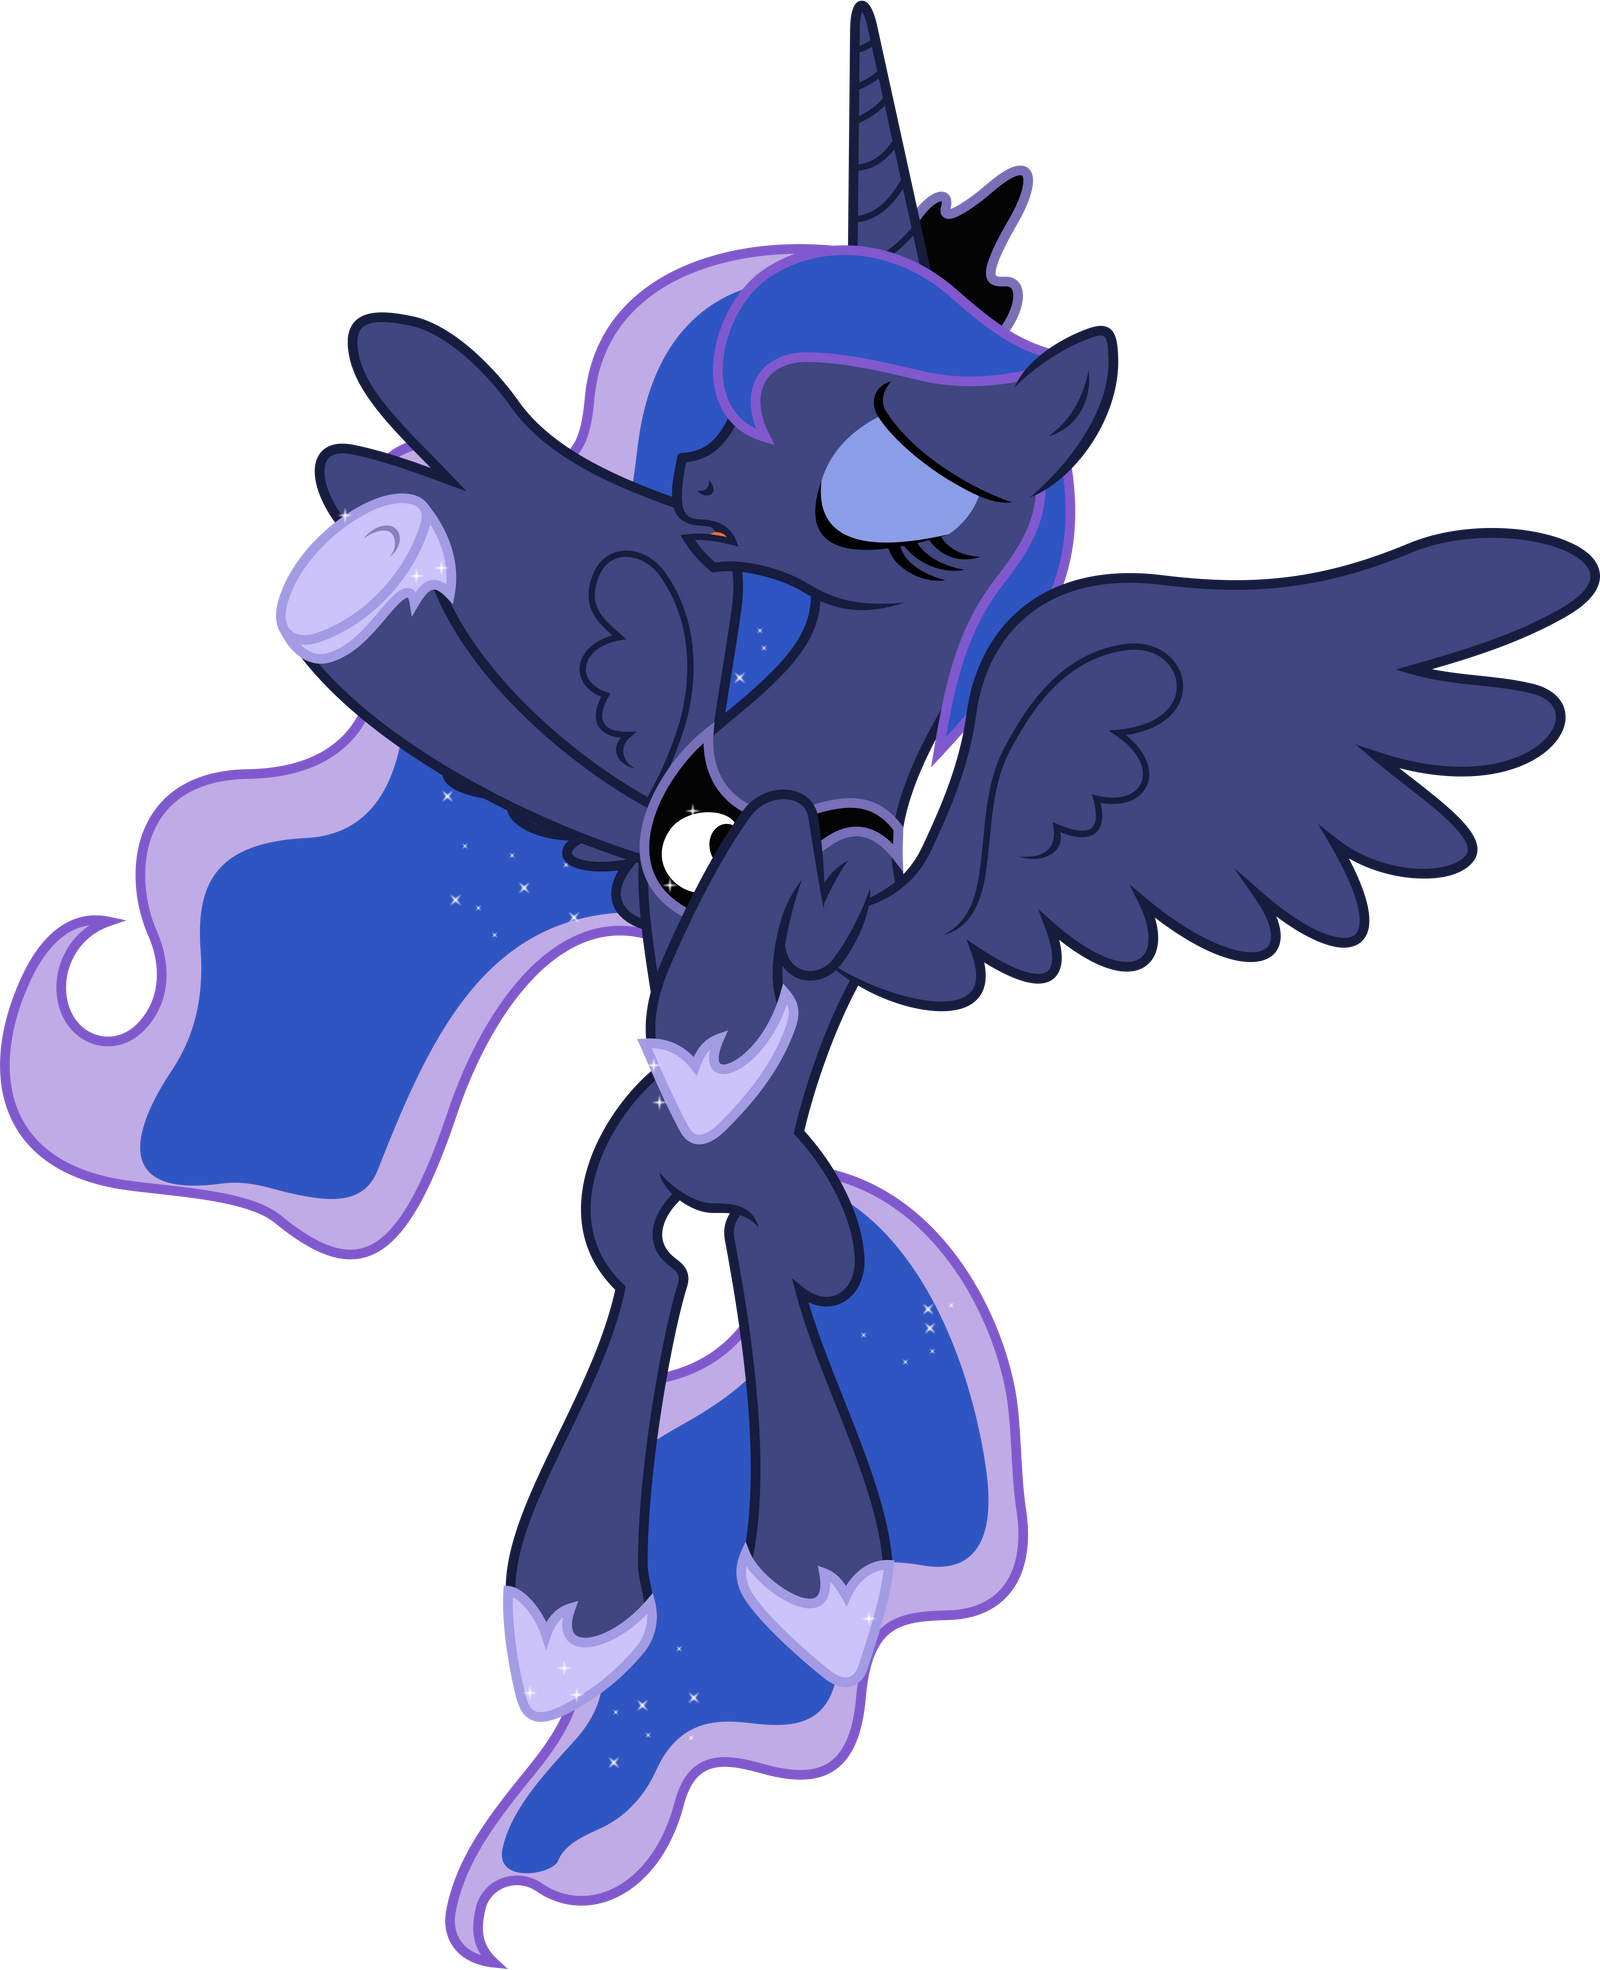 Princess Luna Flying 3 By 90sigma On Deviantart